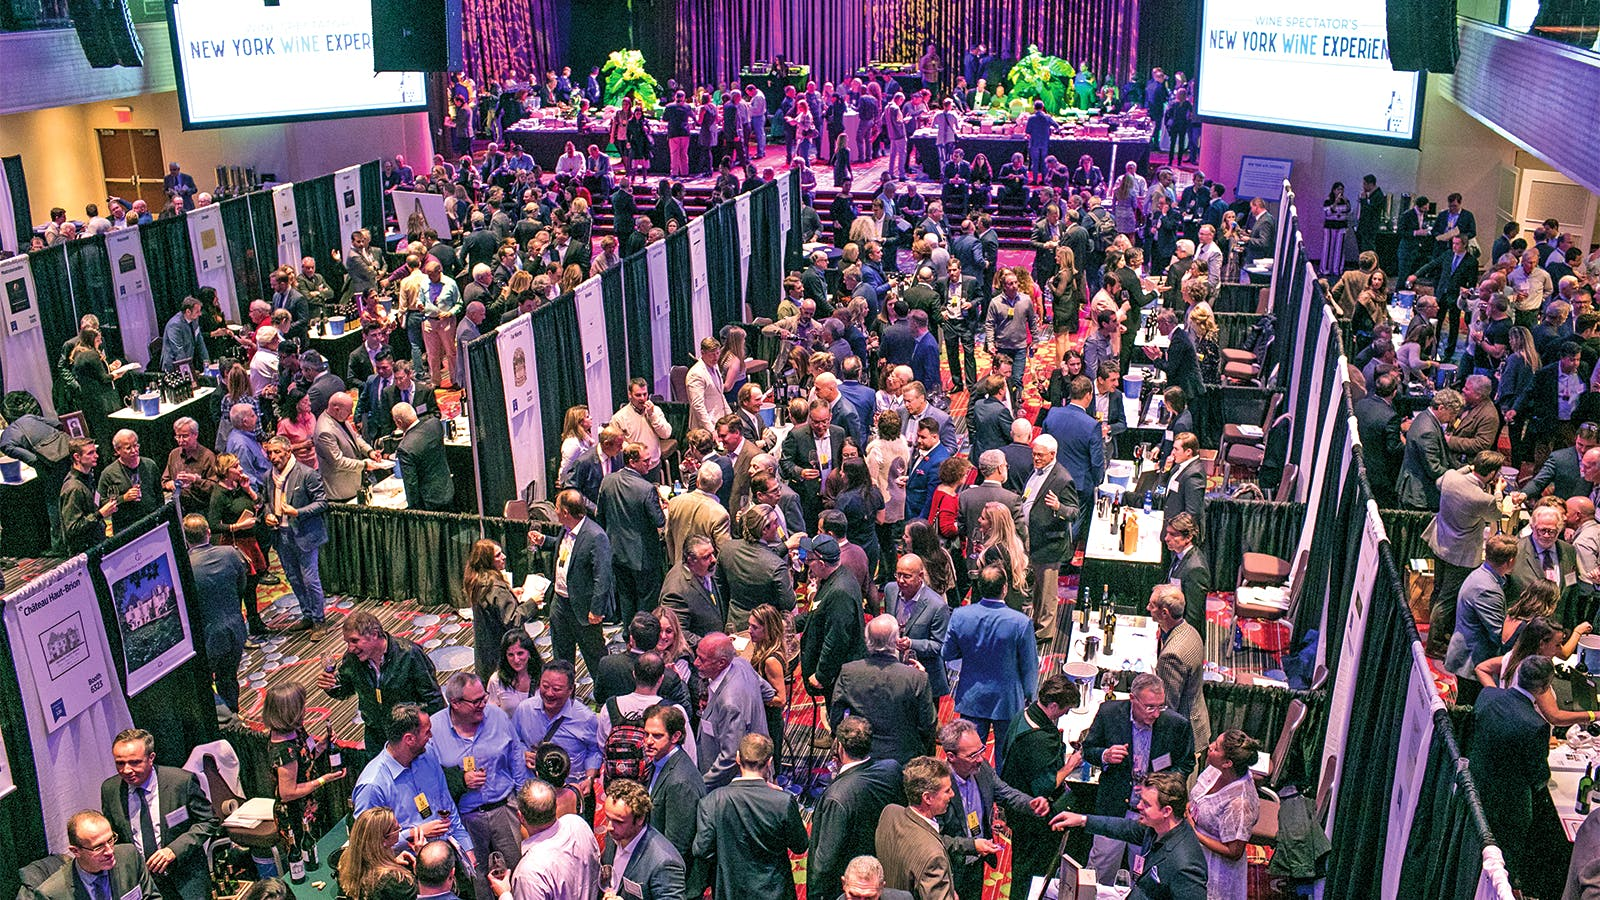 New York 2018 Wine Experience